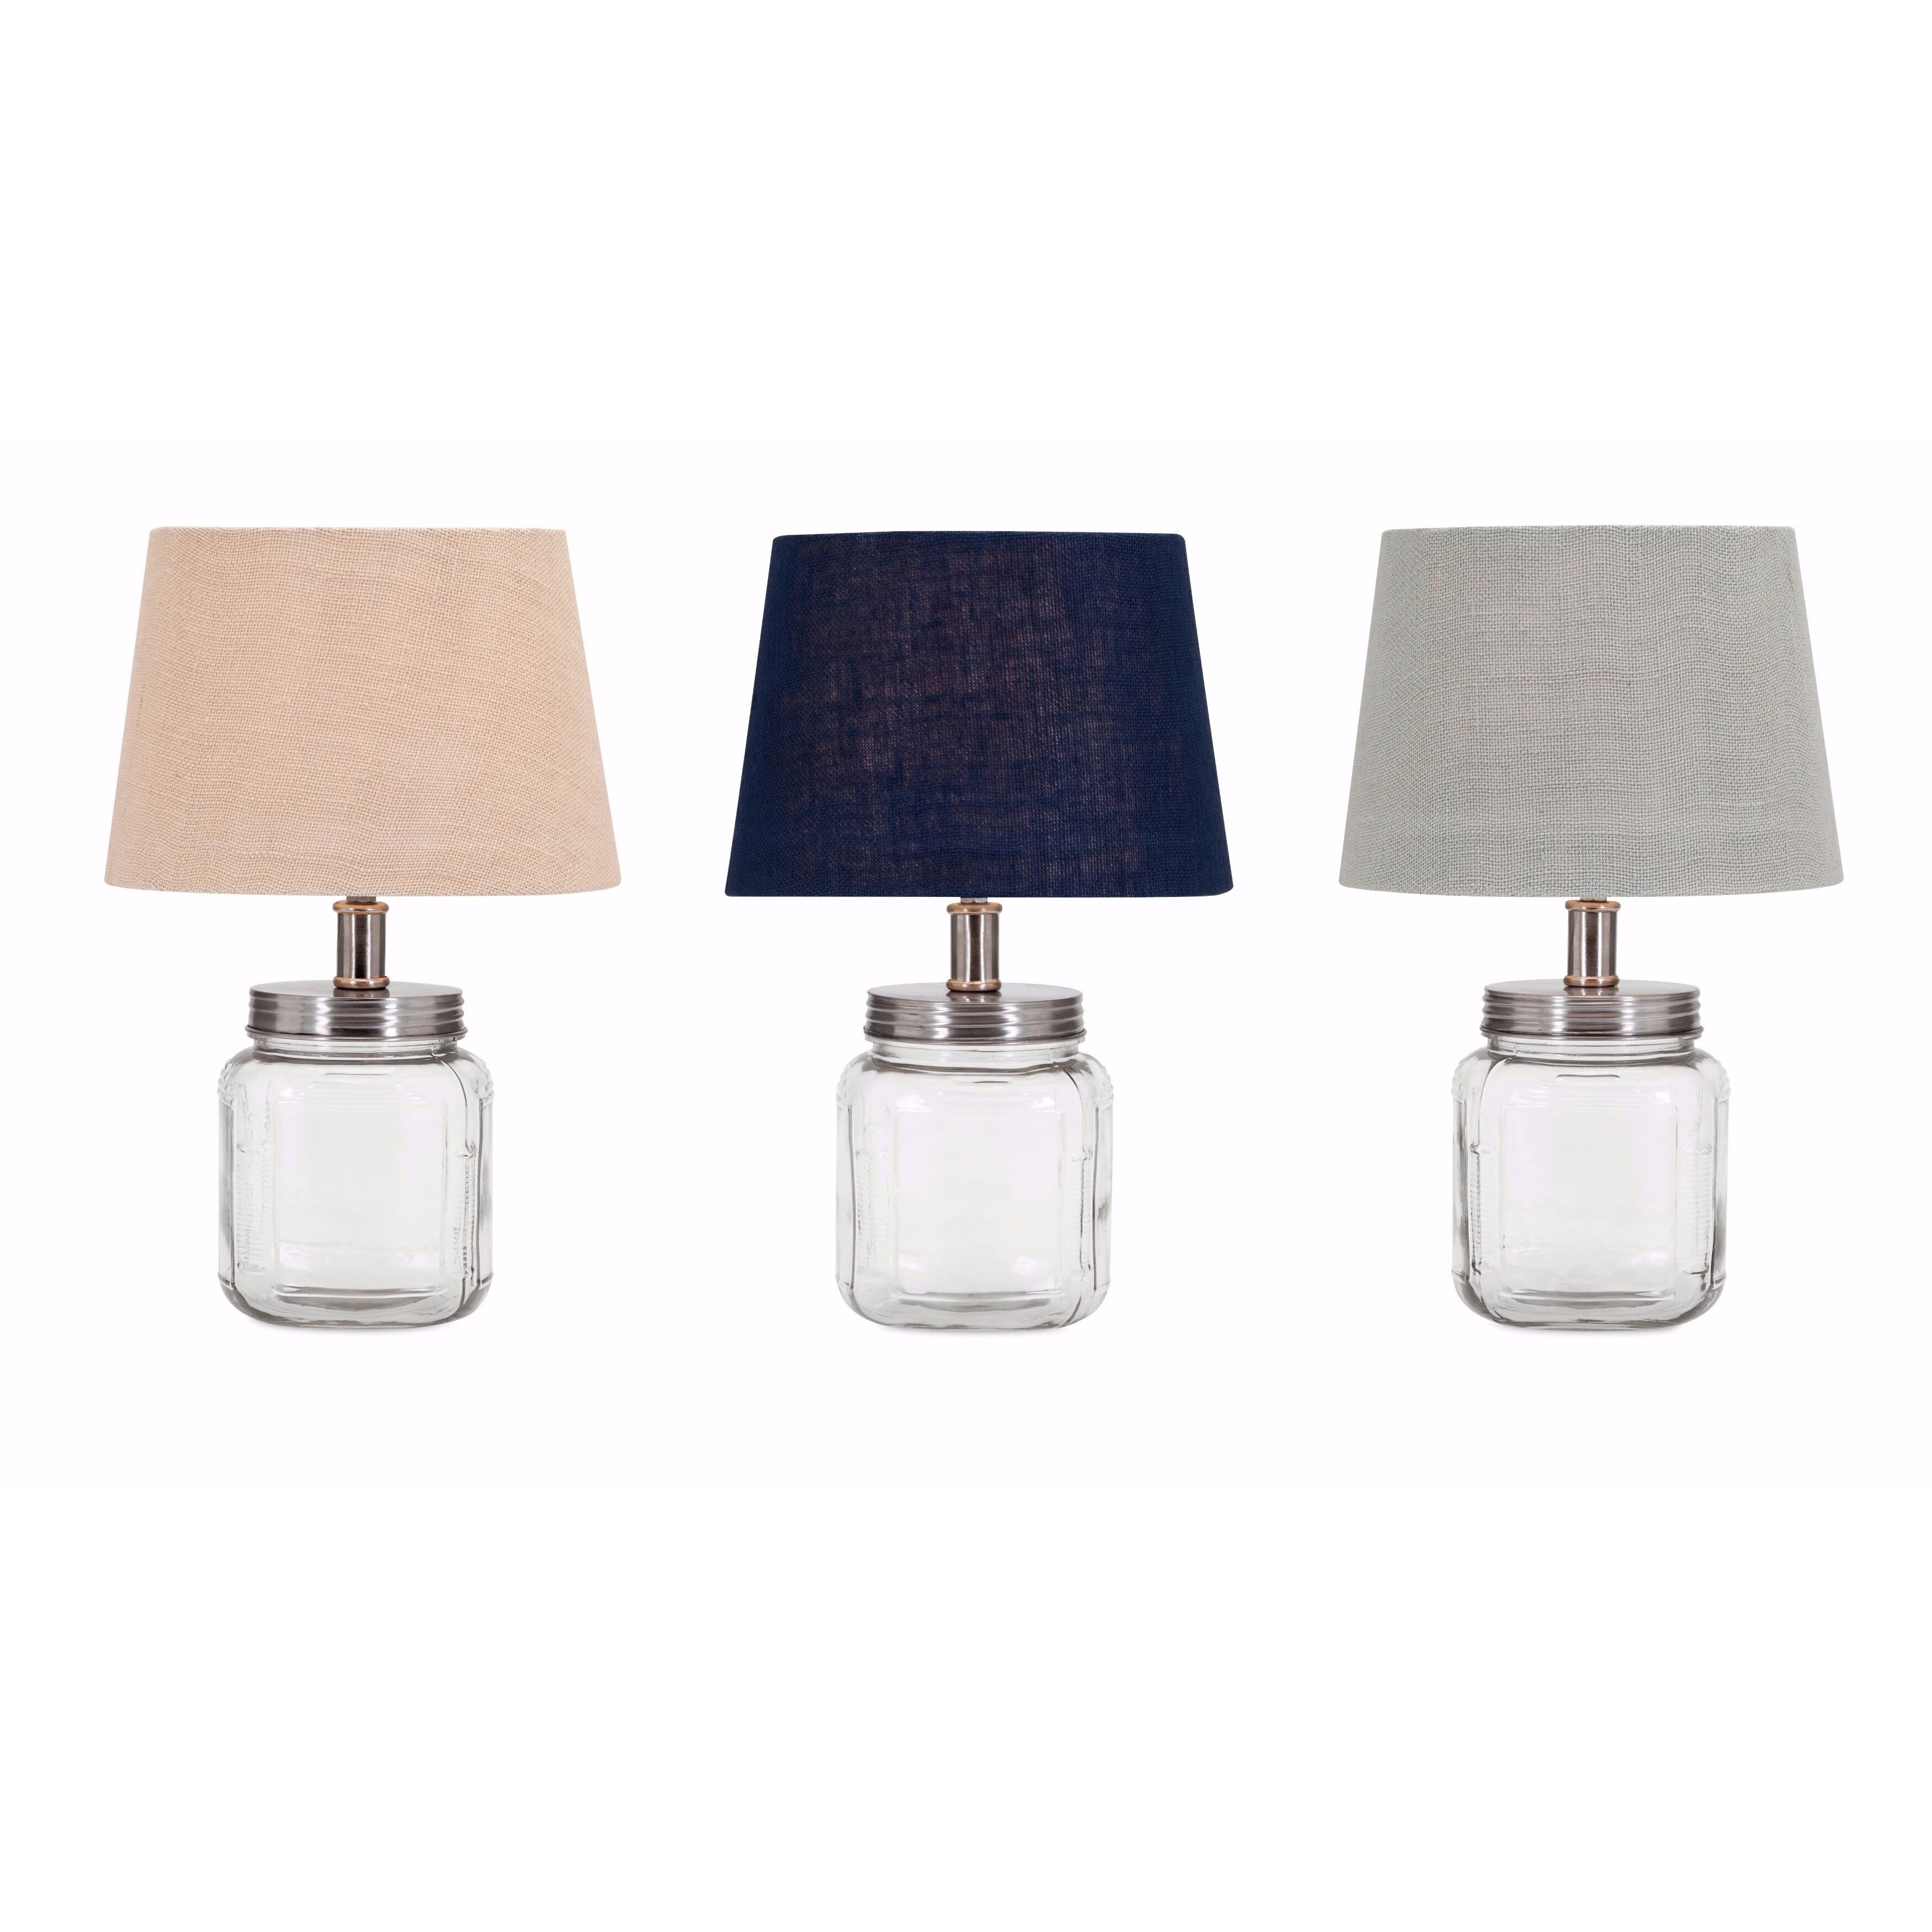 IMAX Ella Elaine Fillable Glass Jar Lamps - Set of 3 (Tab...